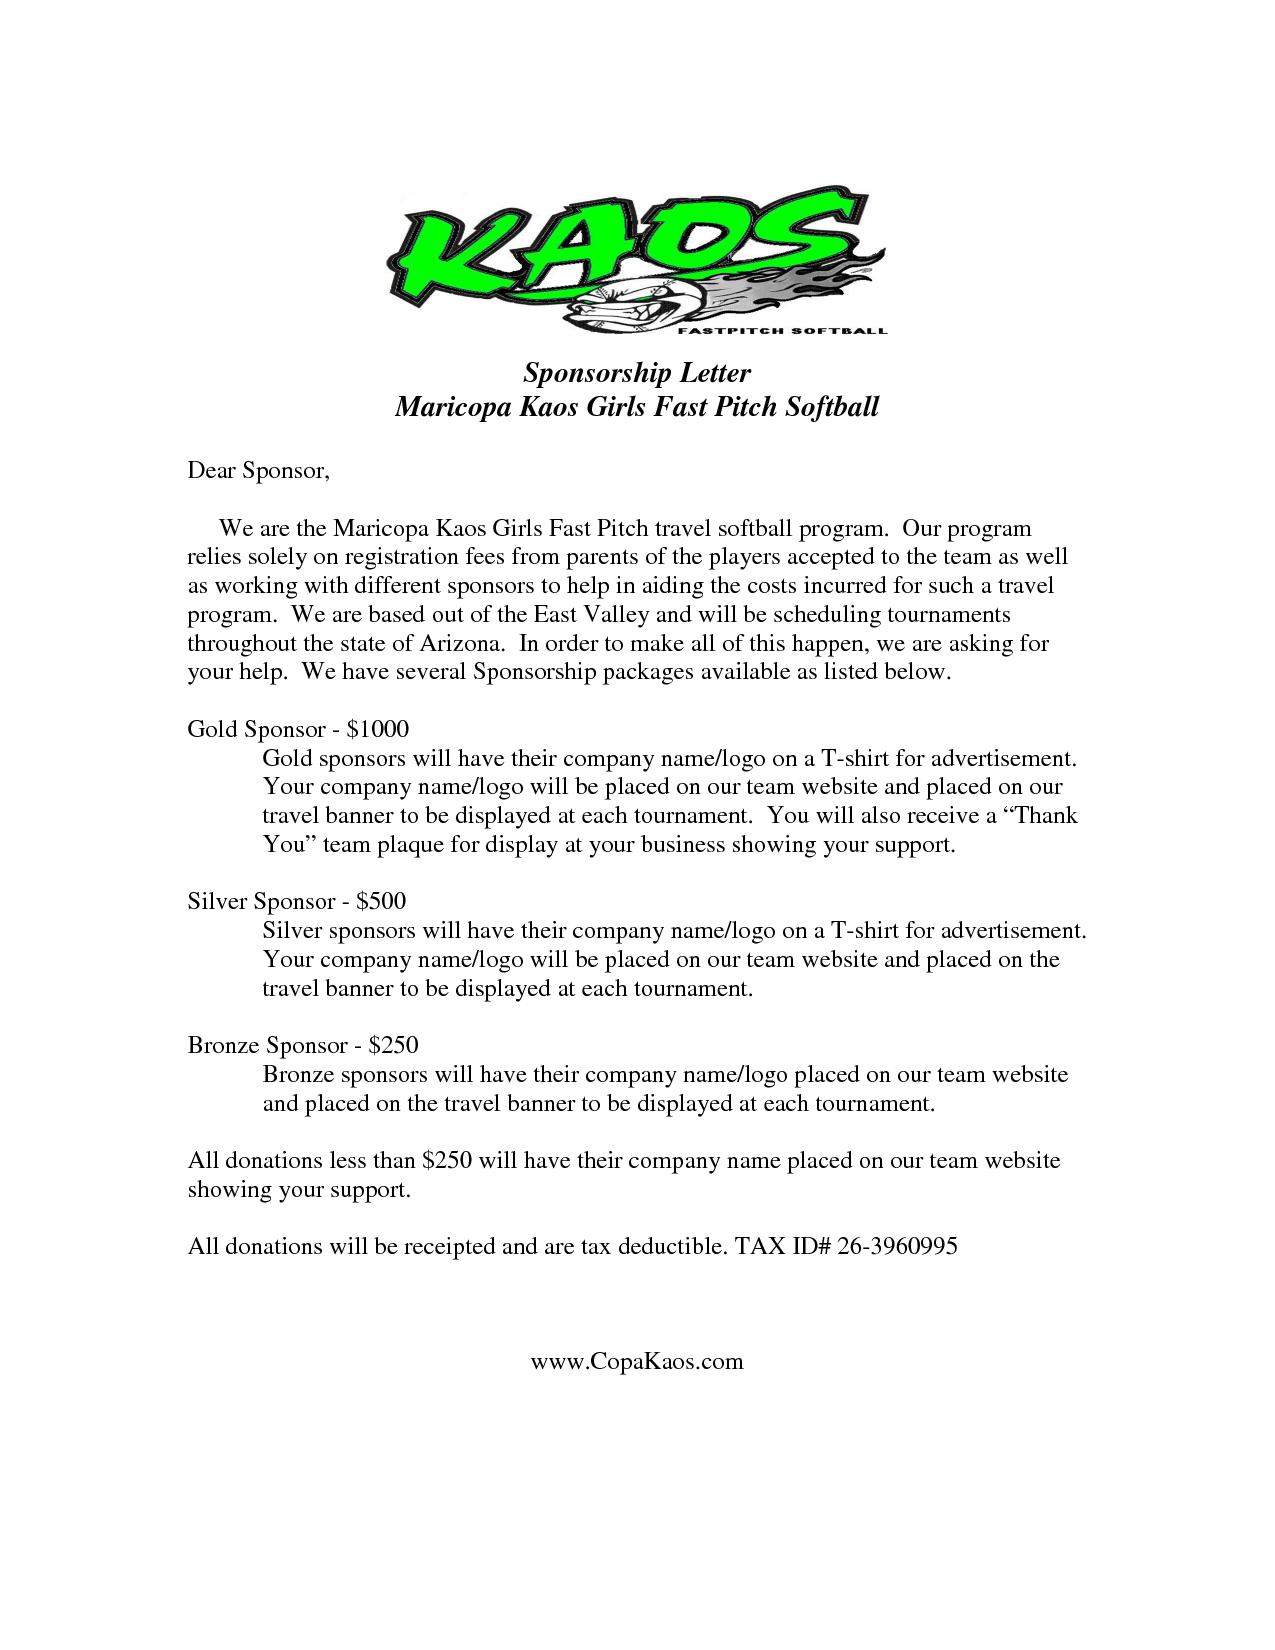 Golf tournament Donation Letter Template - Image Result for Sample Sponsor Request Letter Donation